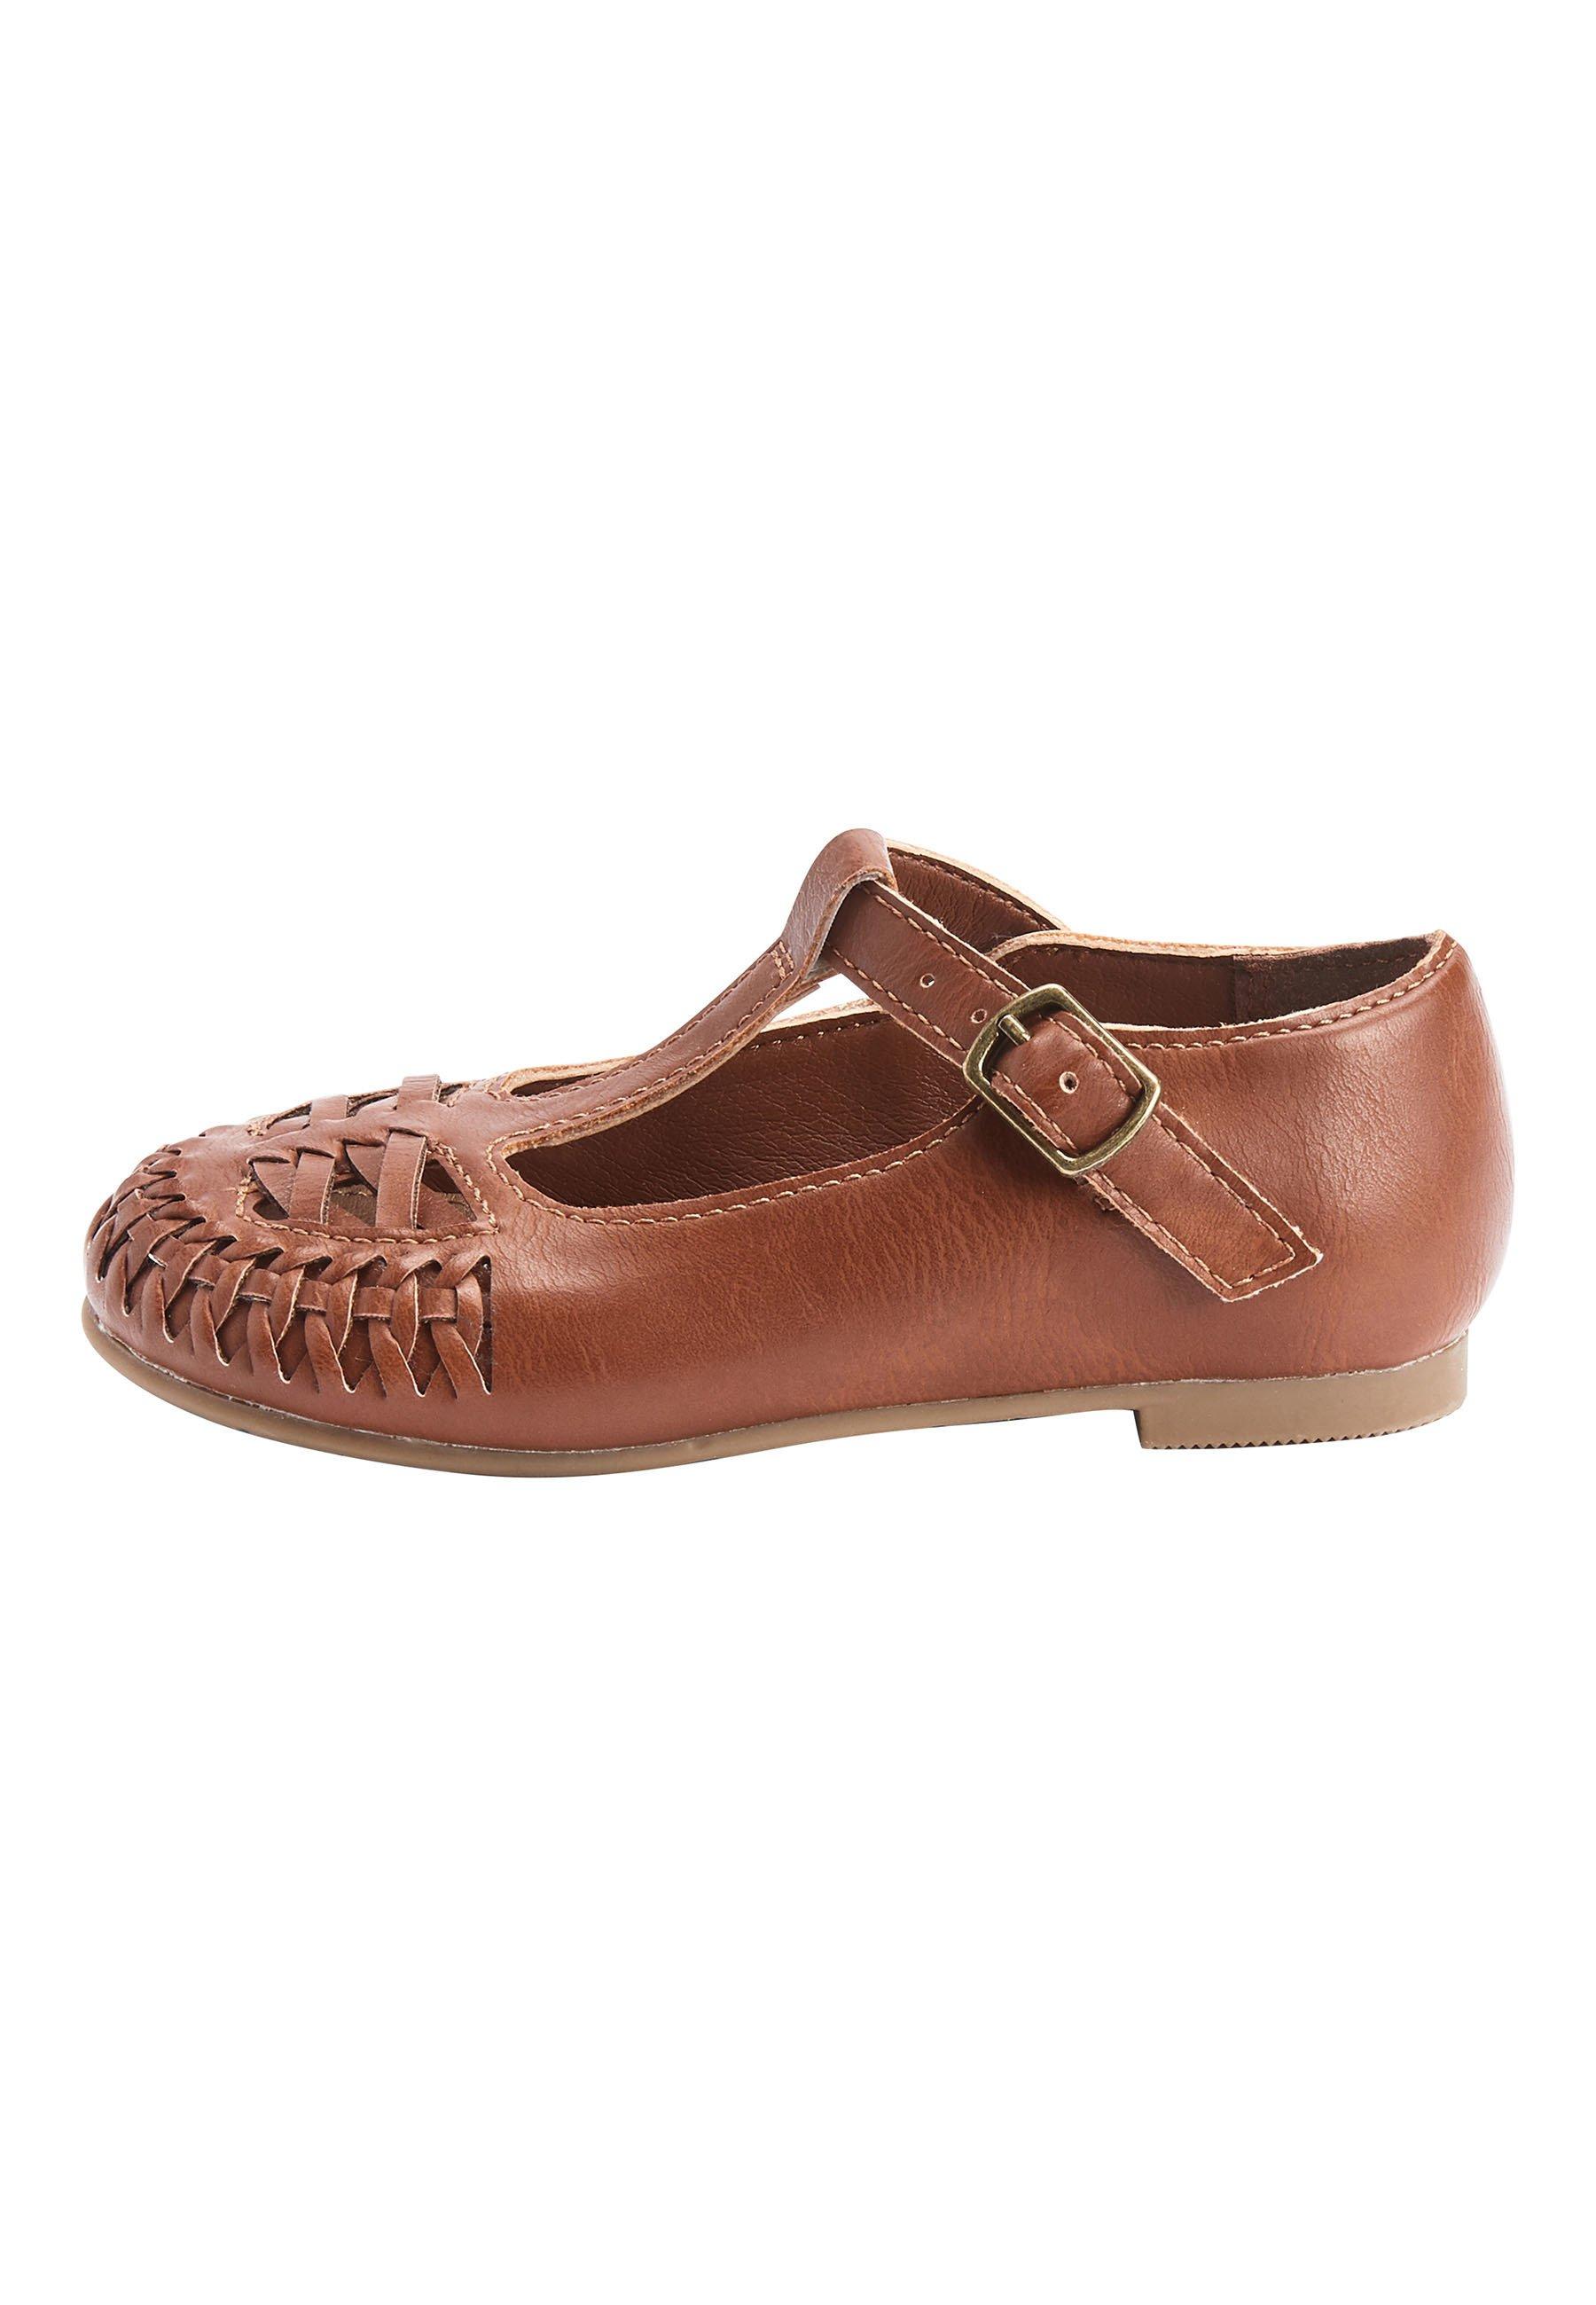 Enfant WHITE WOVEN T-BAR SHOES (YOUNGER) - Chaussures premiers pas